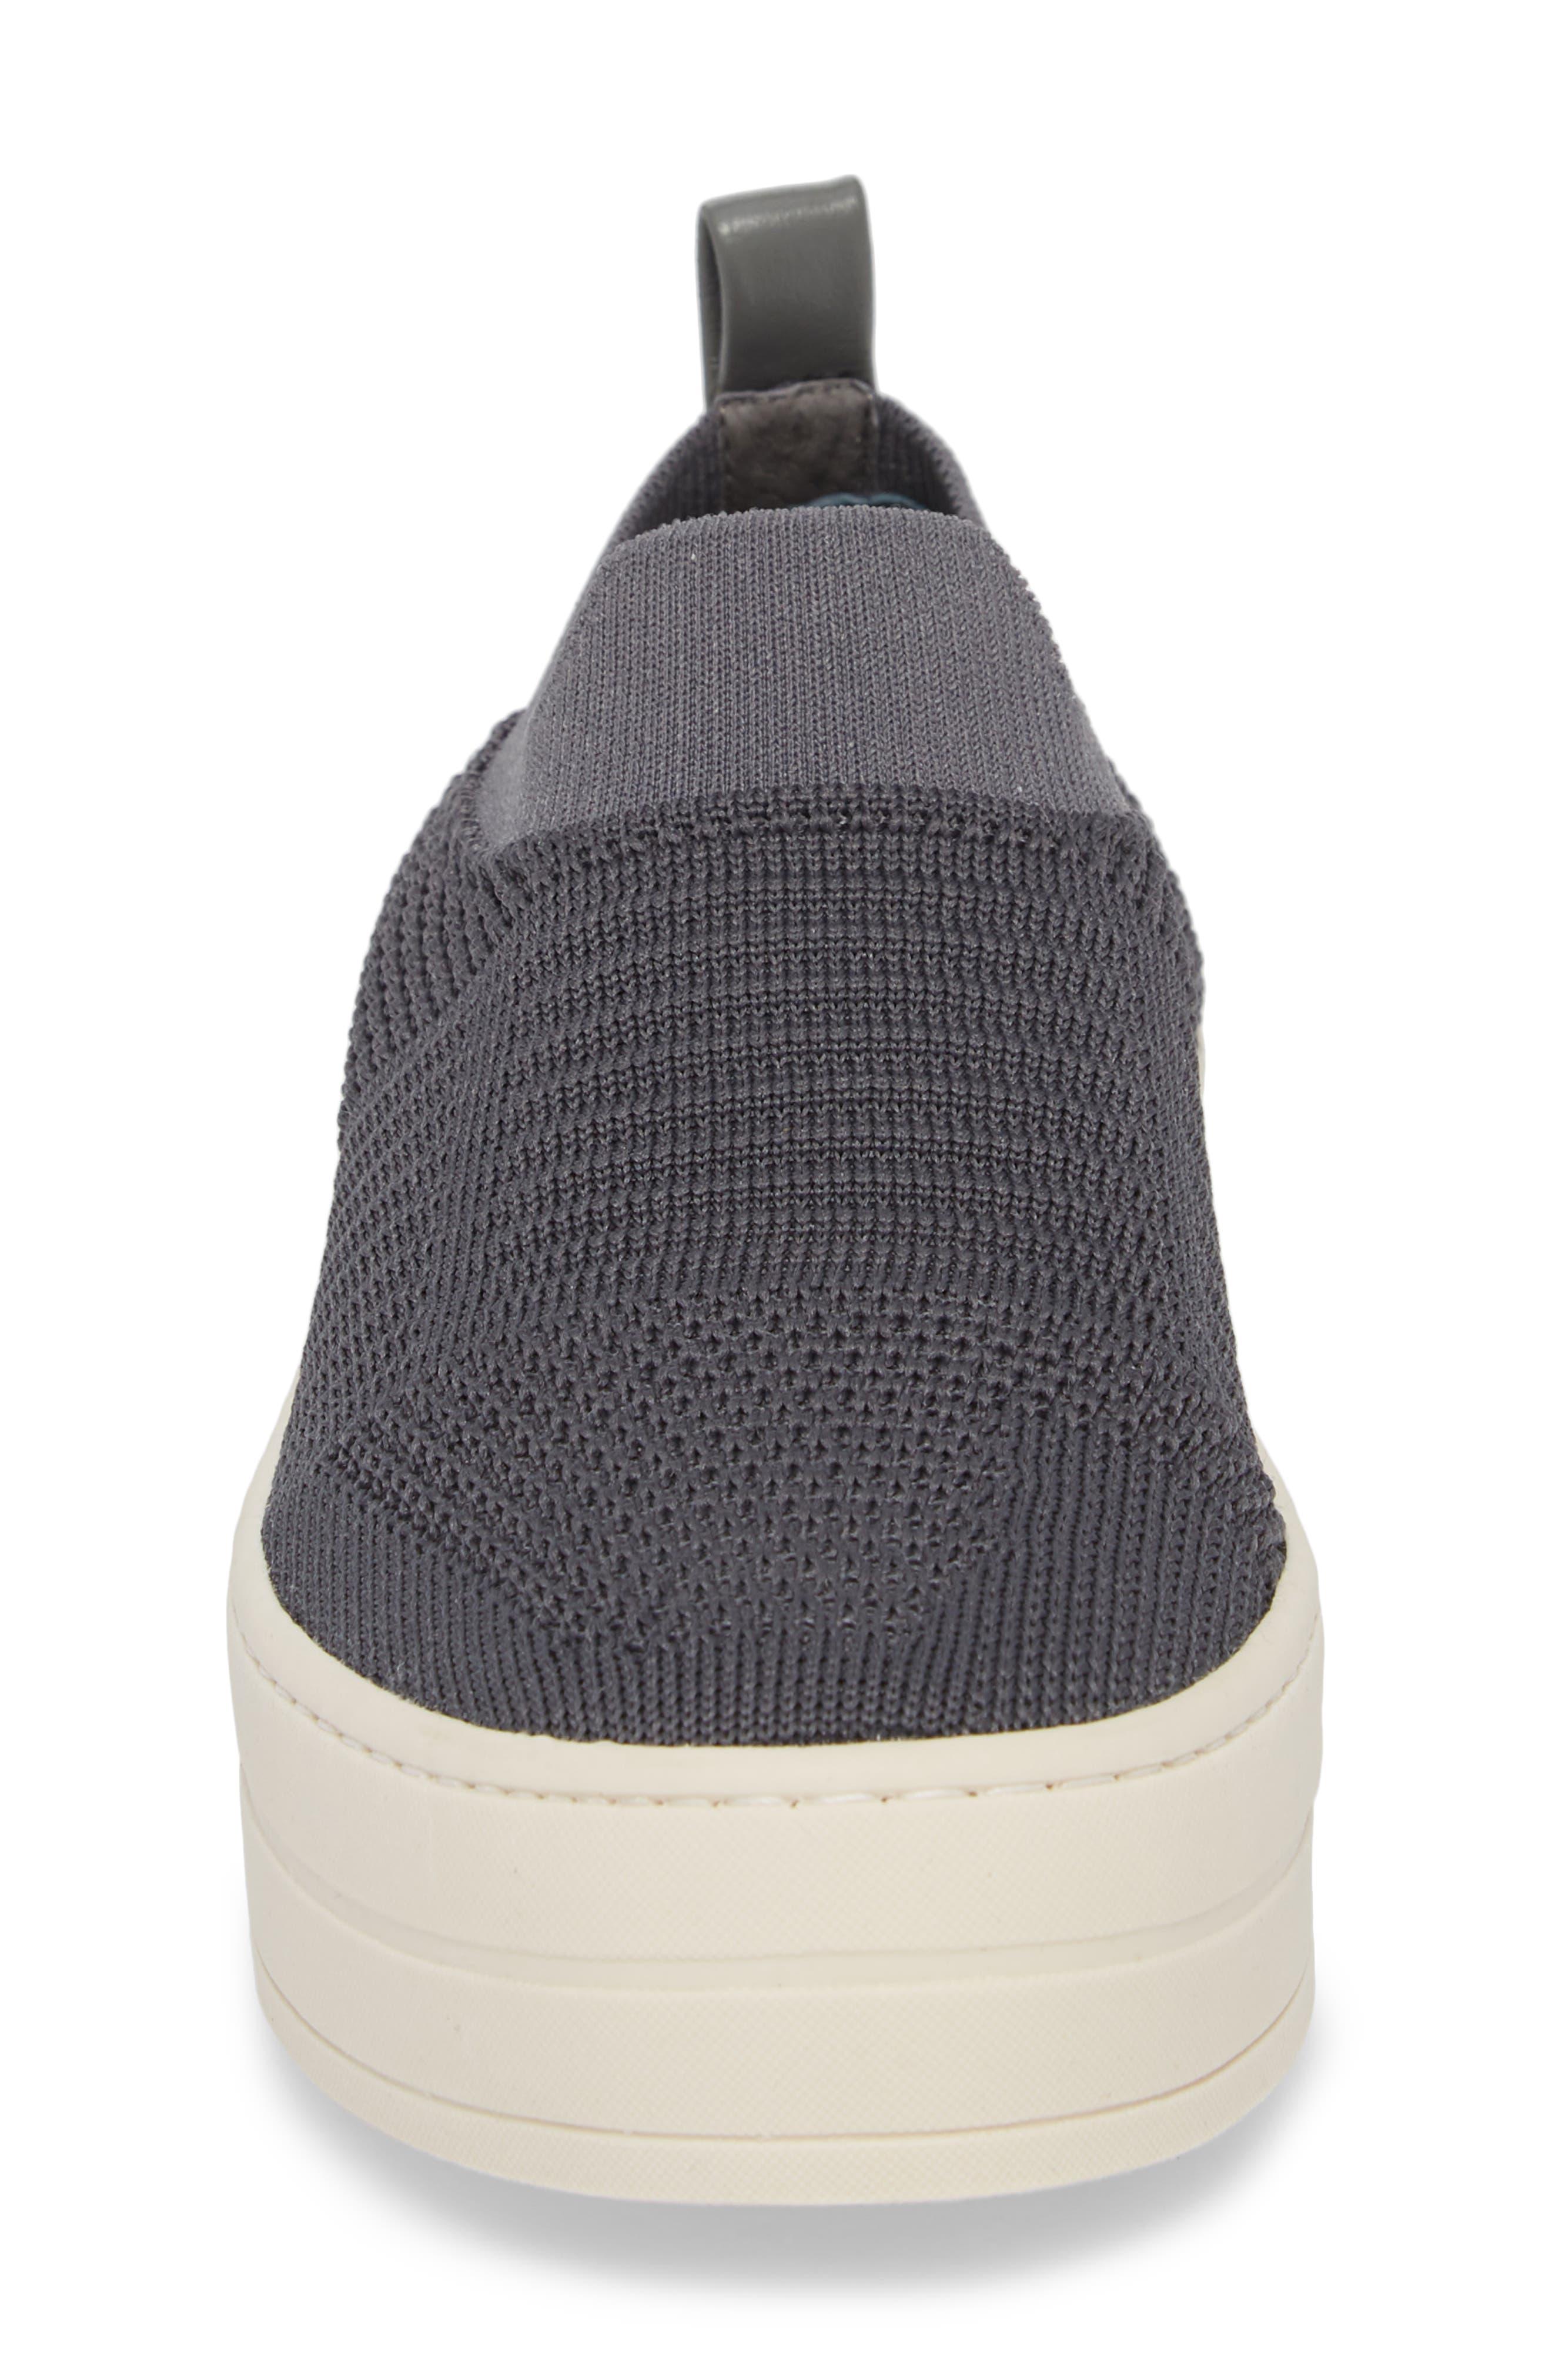 Hilo Platform Slip-On Sneaker,                             Alternate thumbnail 4, color,                             Grey Fabric